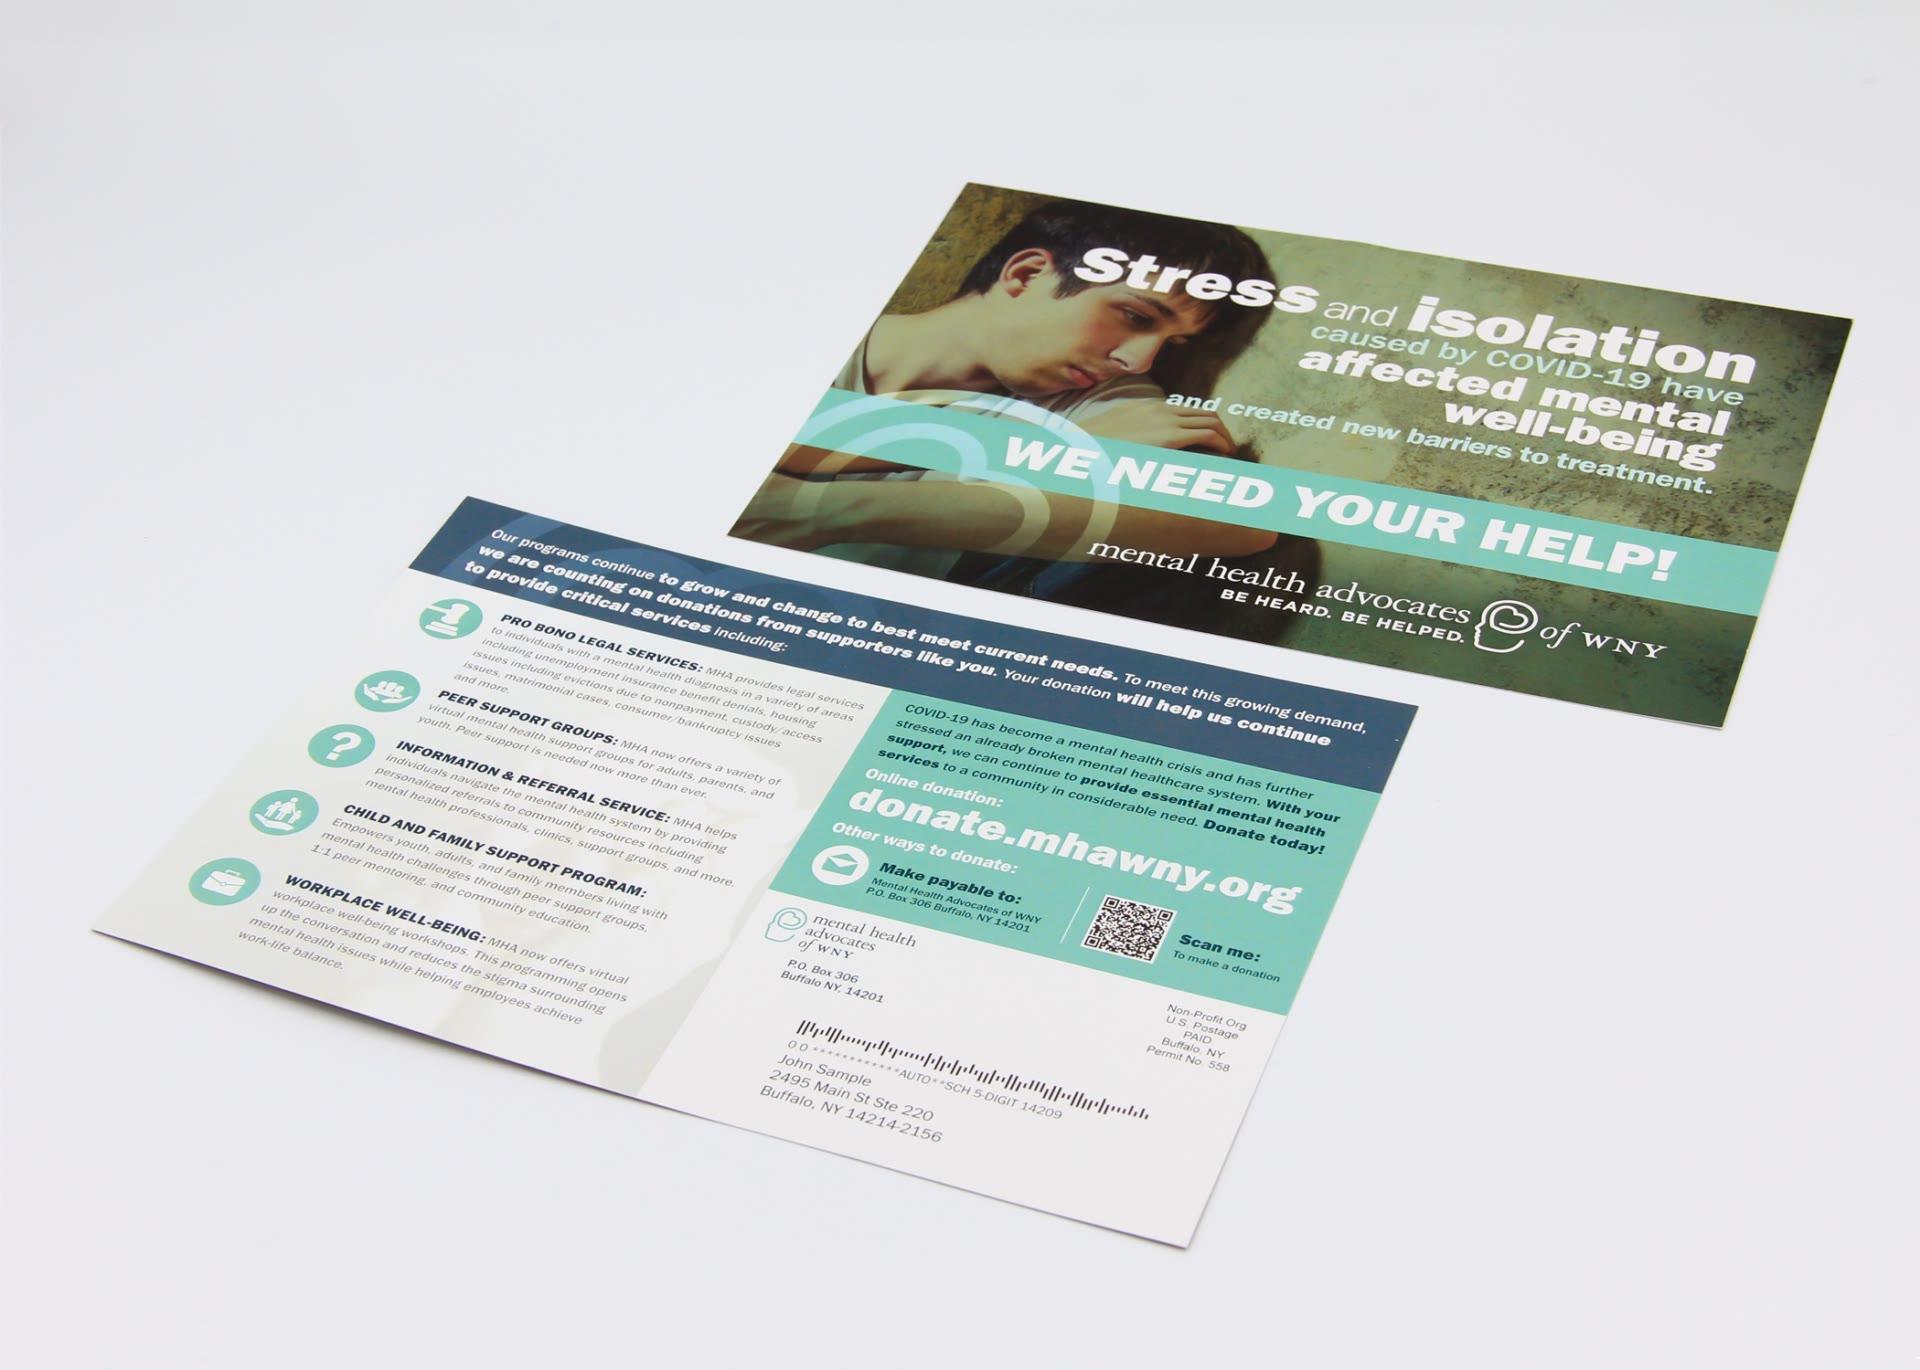 Mental Health Associates postcard